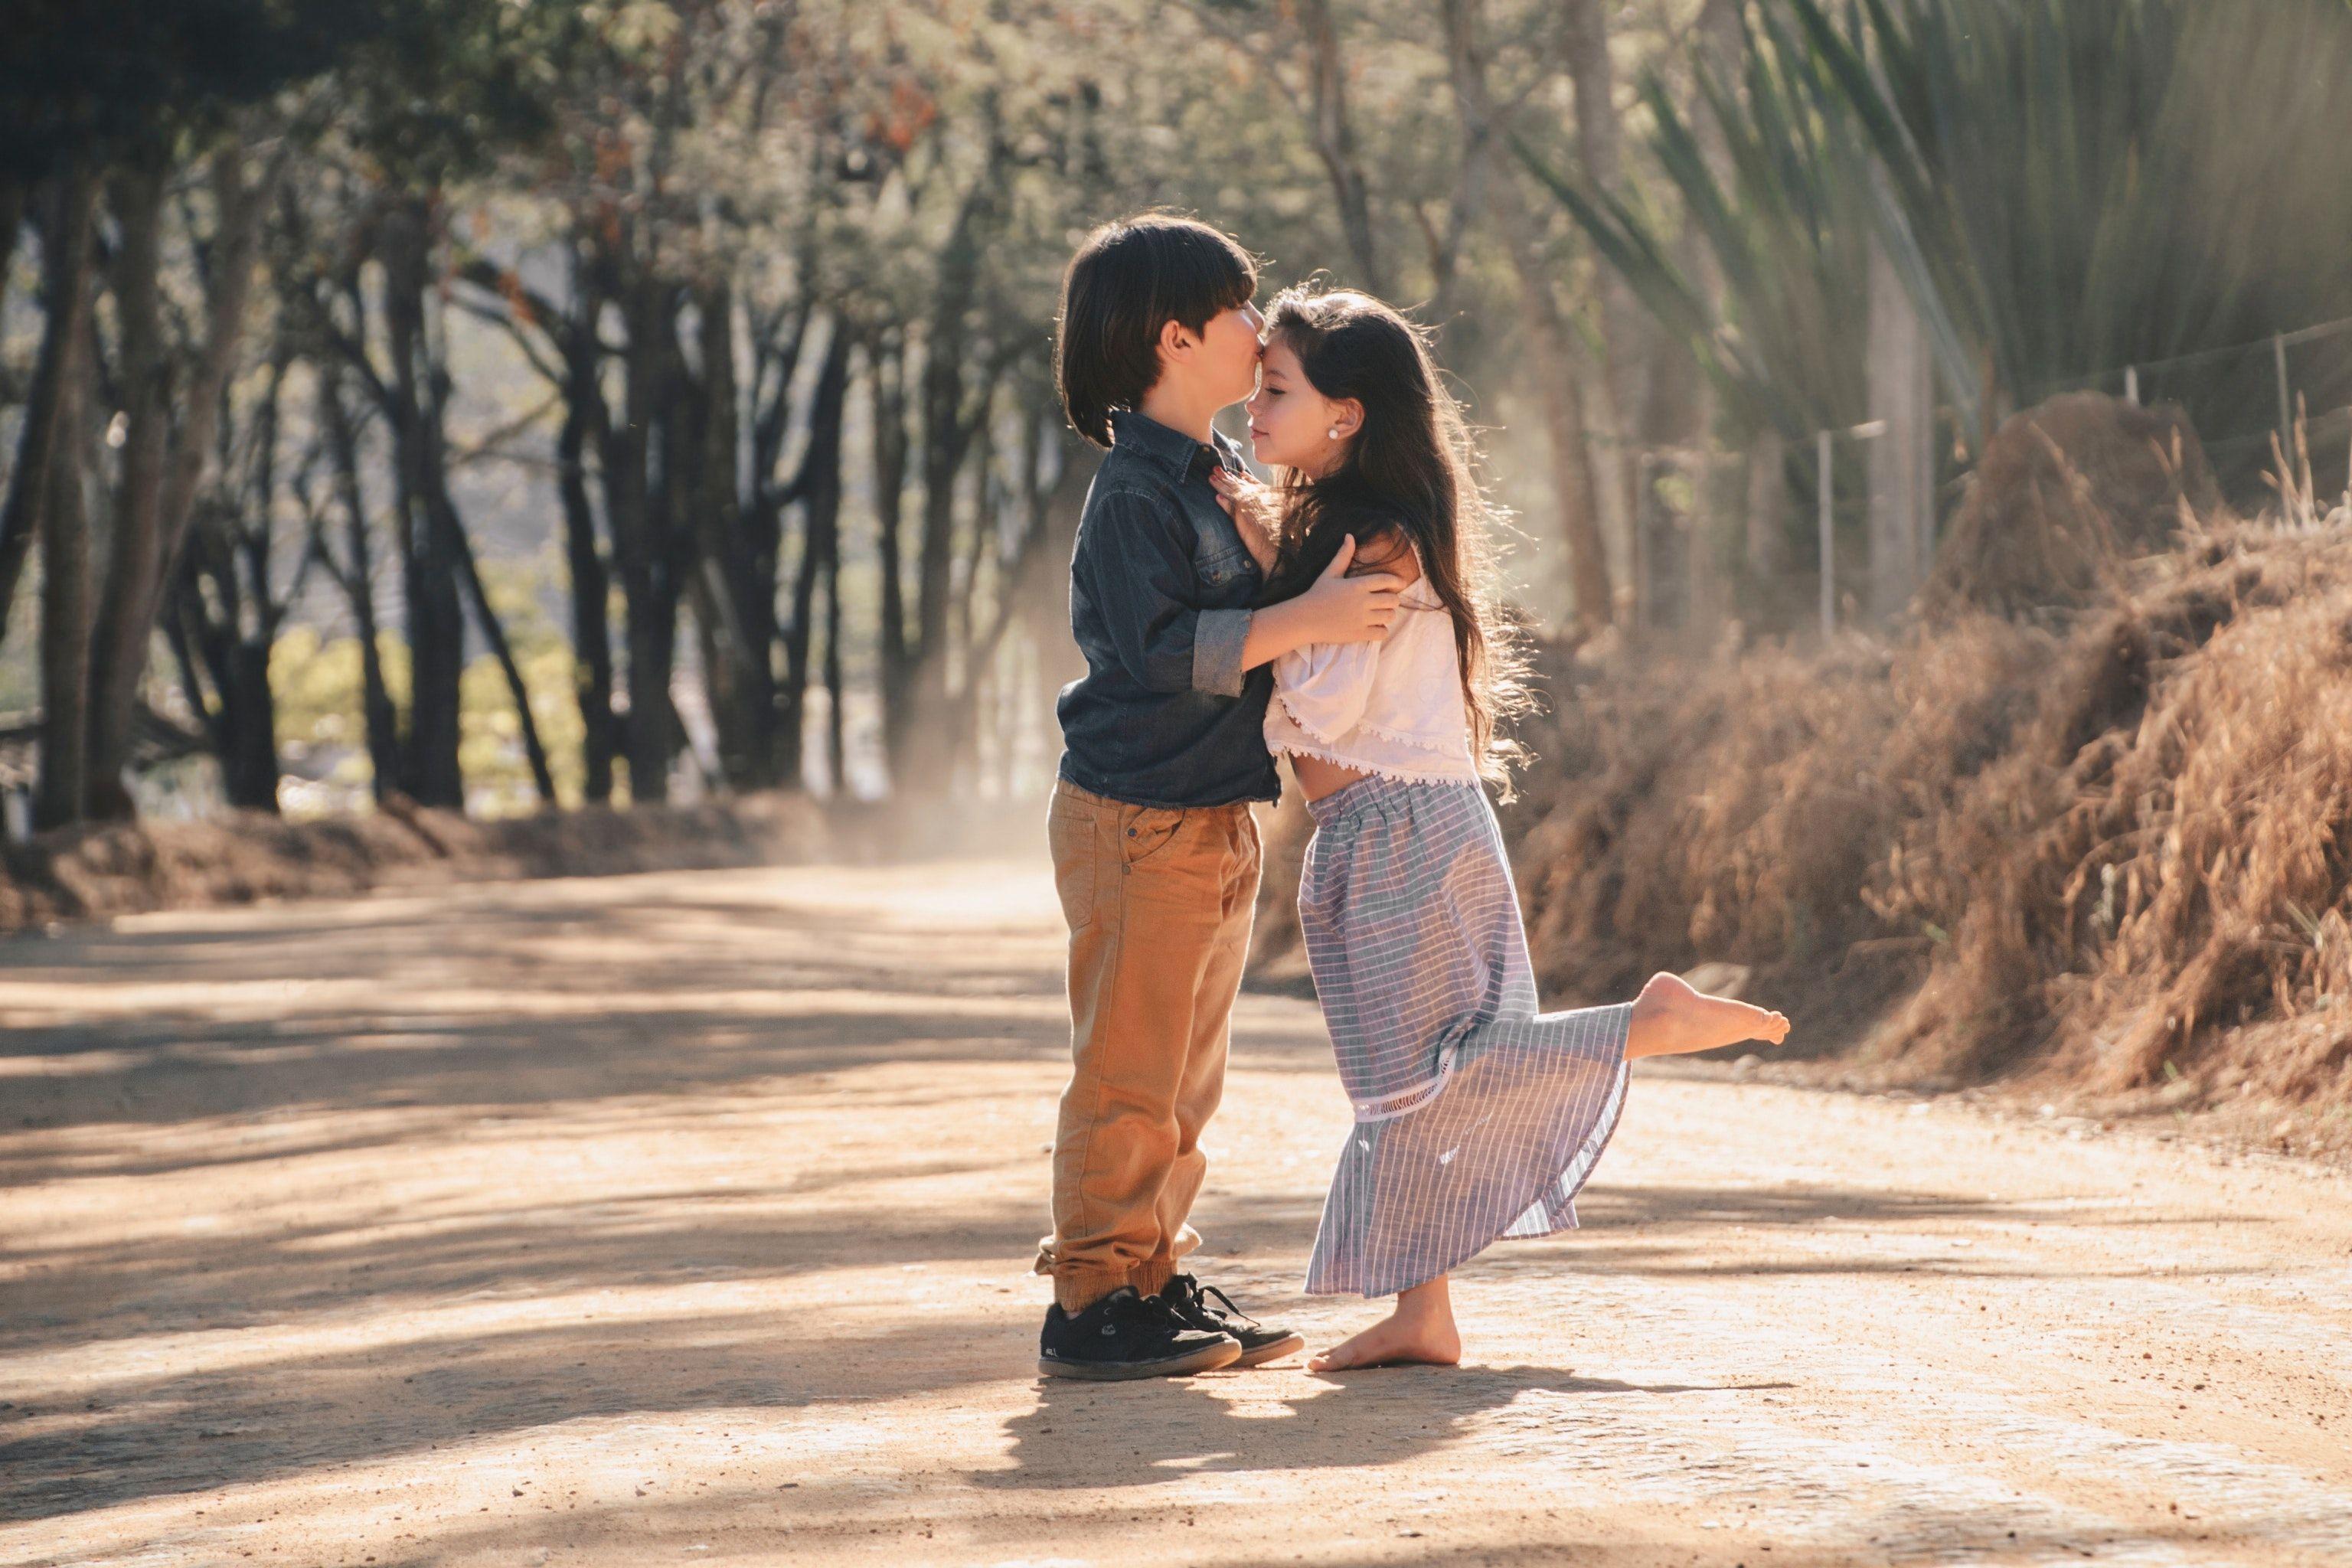 Adorable Kissing Adorable Kissing Boy Girl Tees